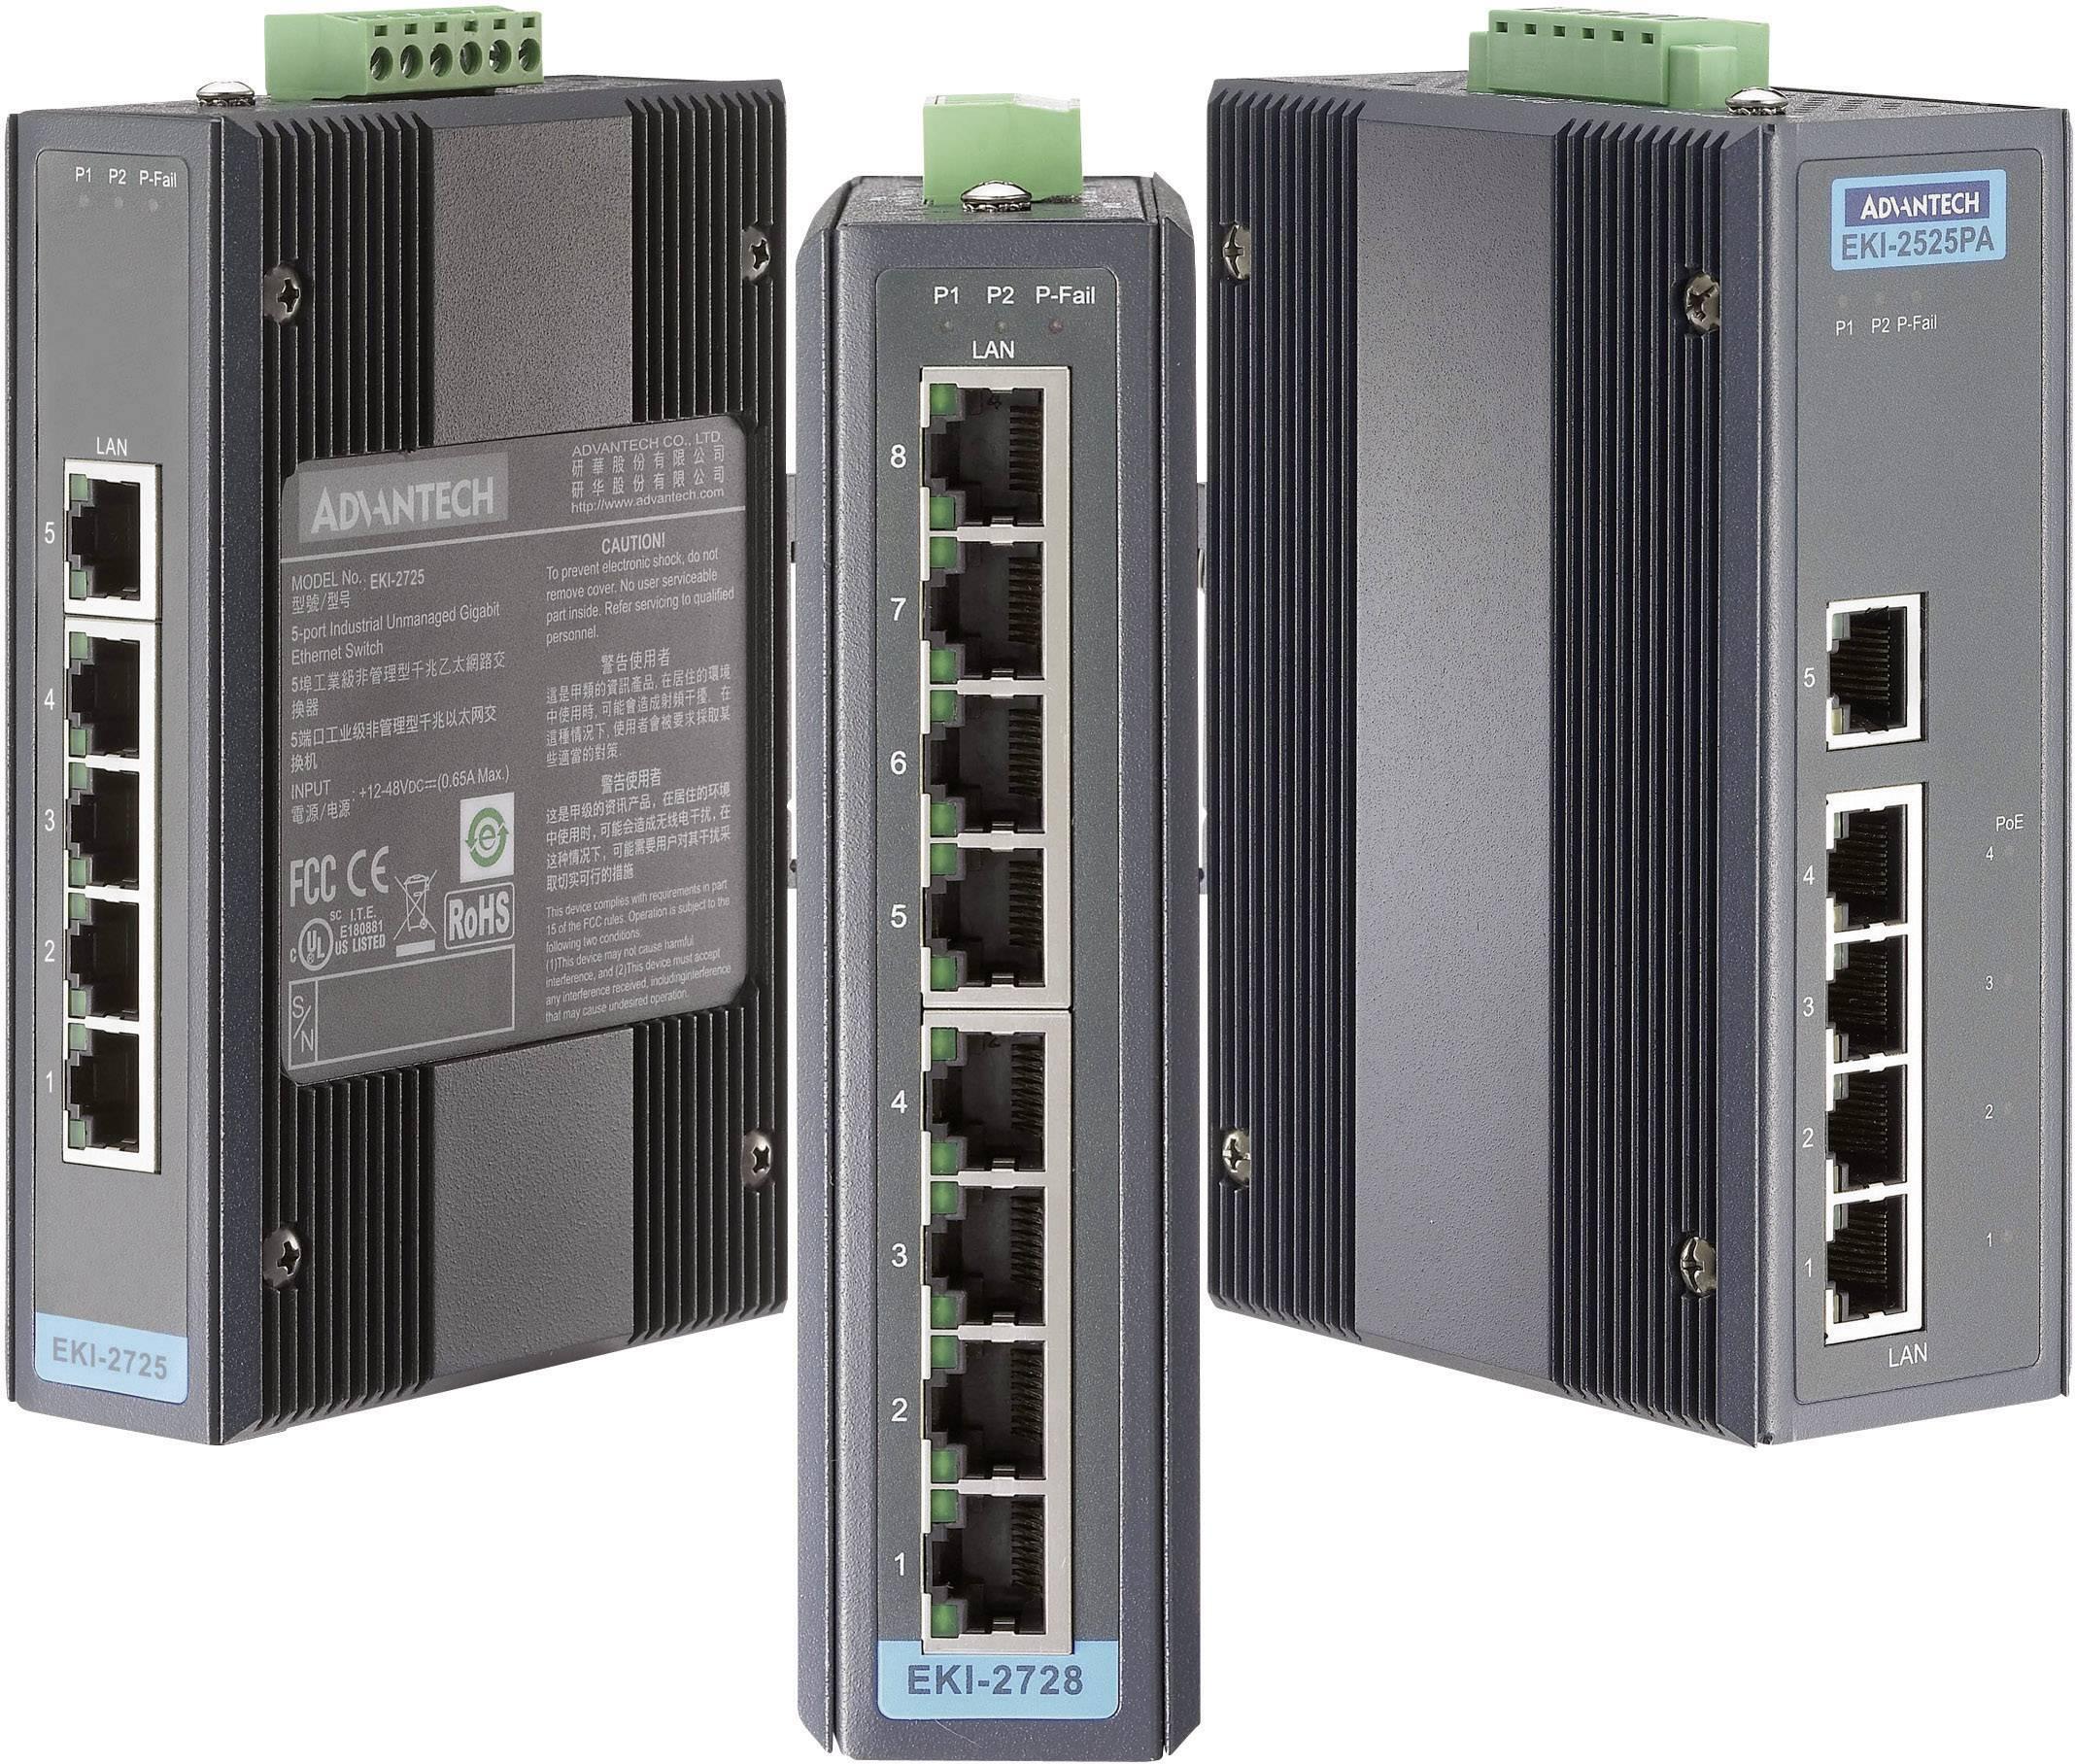 Ethernetový switch Gb Advantech EKI-2728-AE, 8port., 12 - 48 V/DC